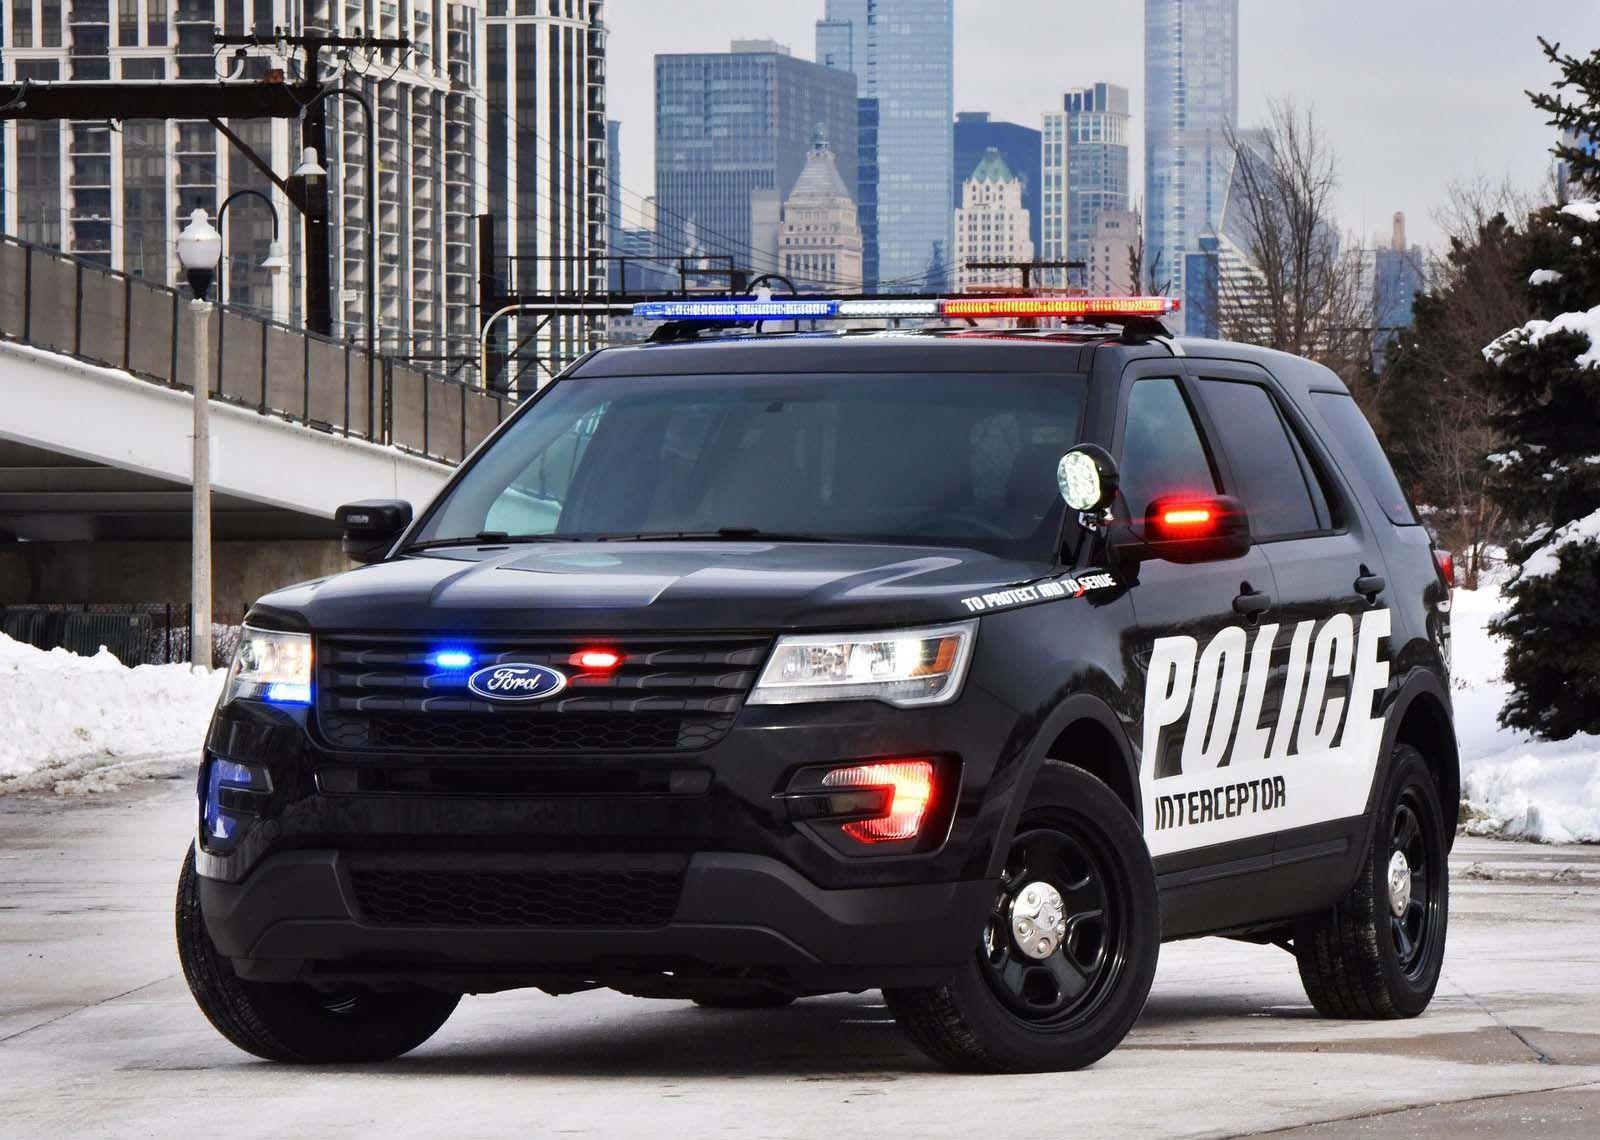 New 2017 Ford Explorer 4wd Police Interceptor Sport Utility For